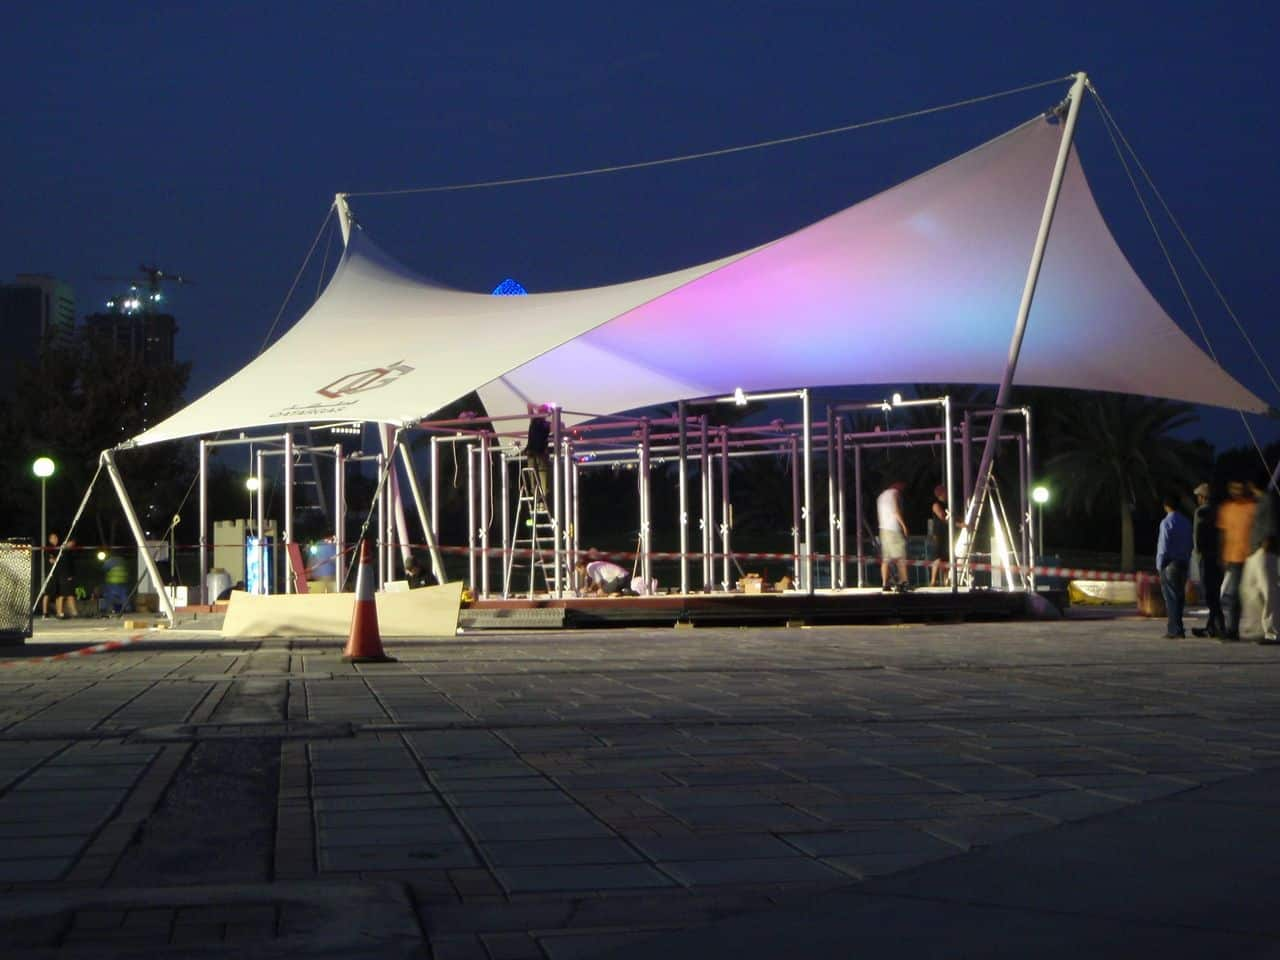 Qatar Gas Exhibition Canopy Architen Landrell